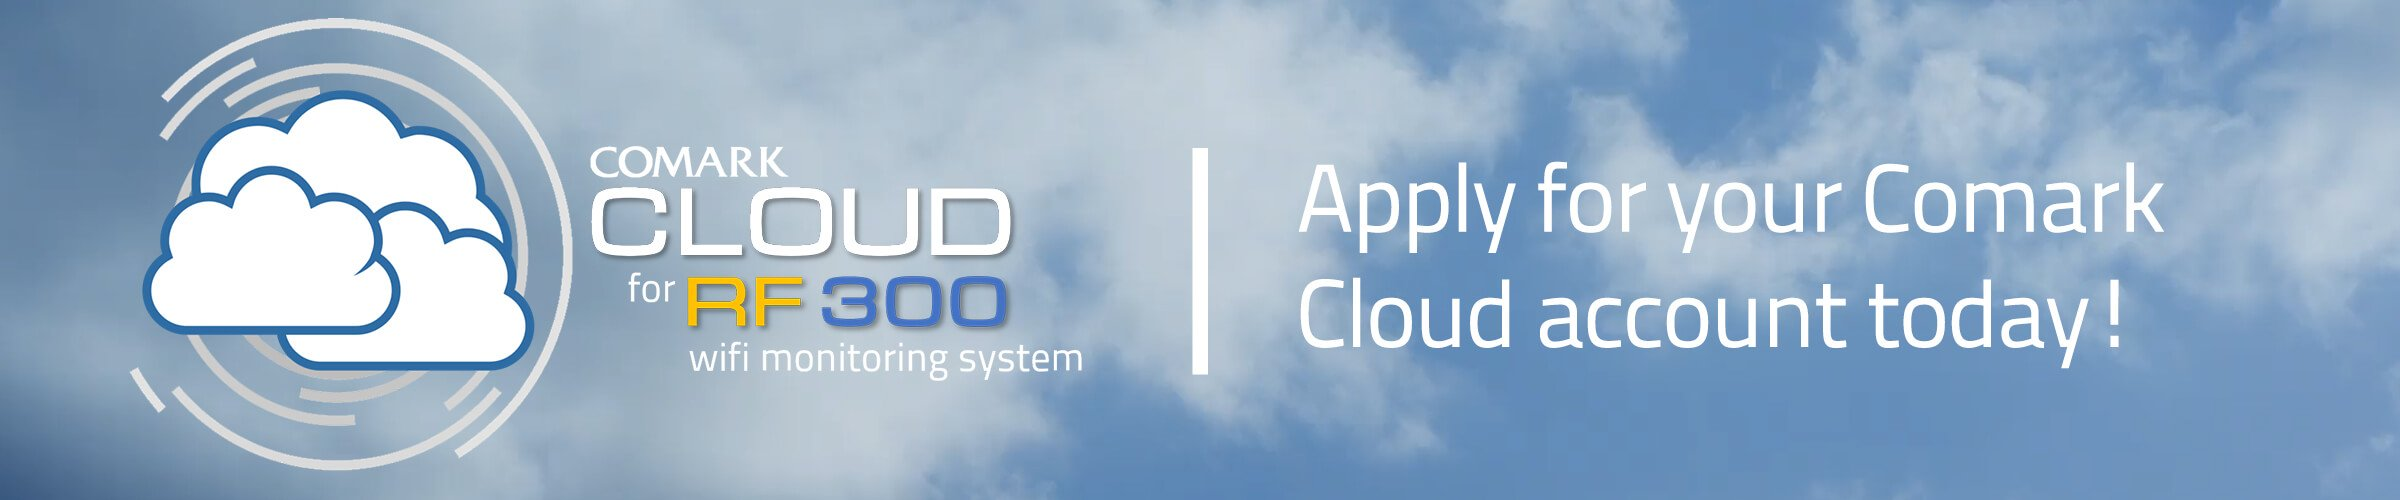 comark-cloud-banner-2019.jpg